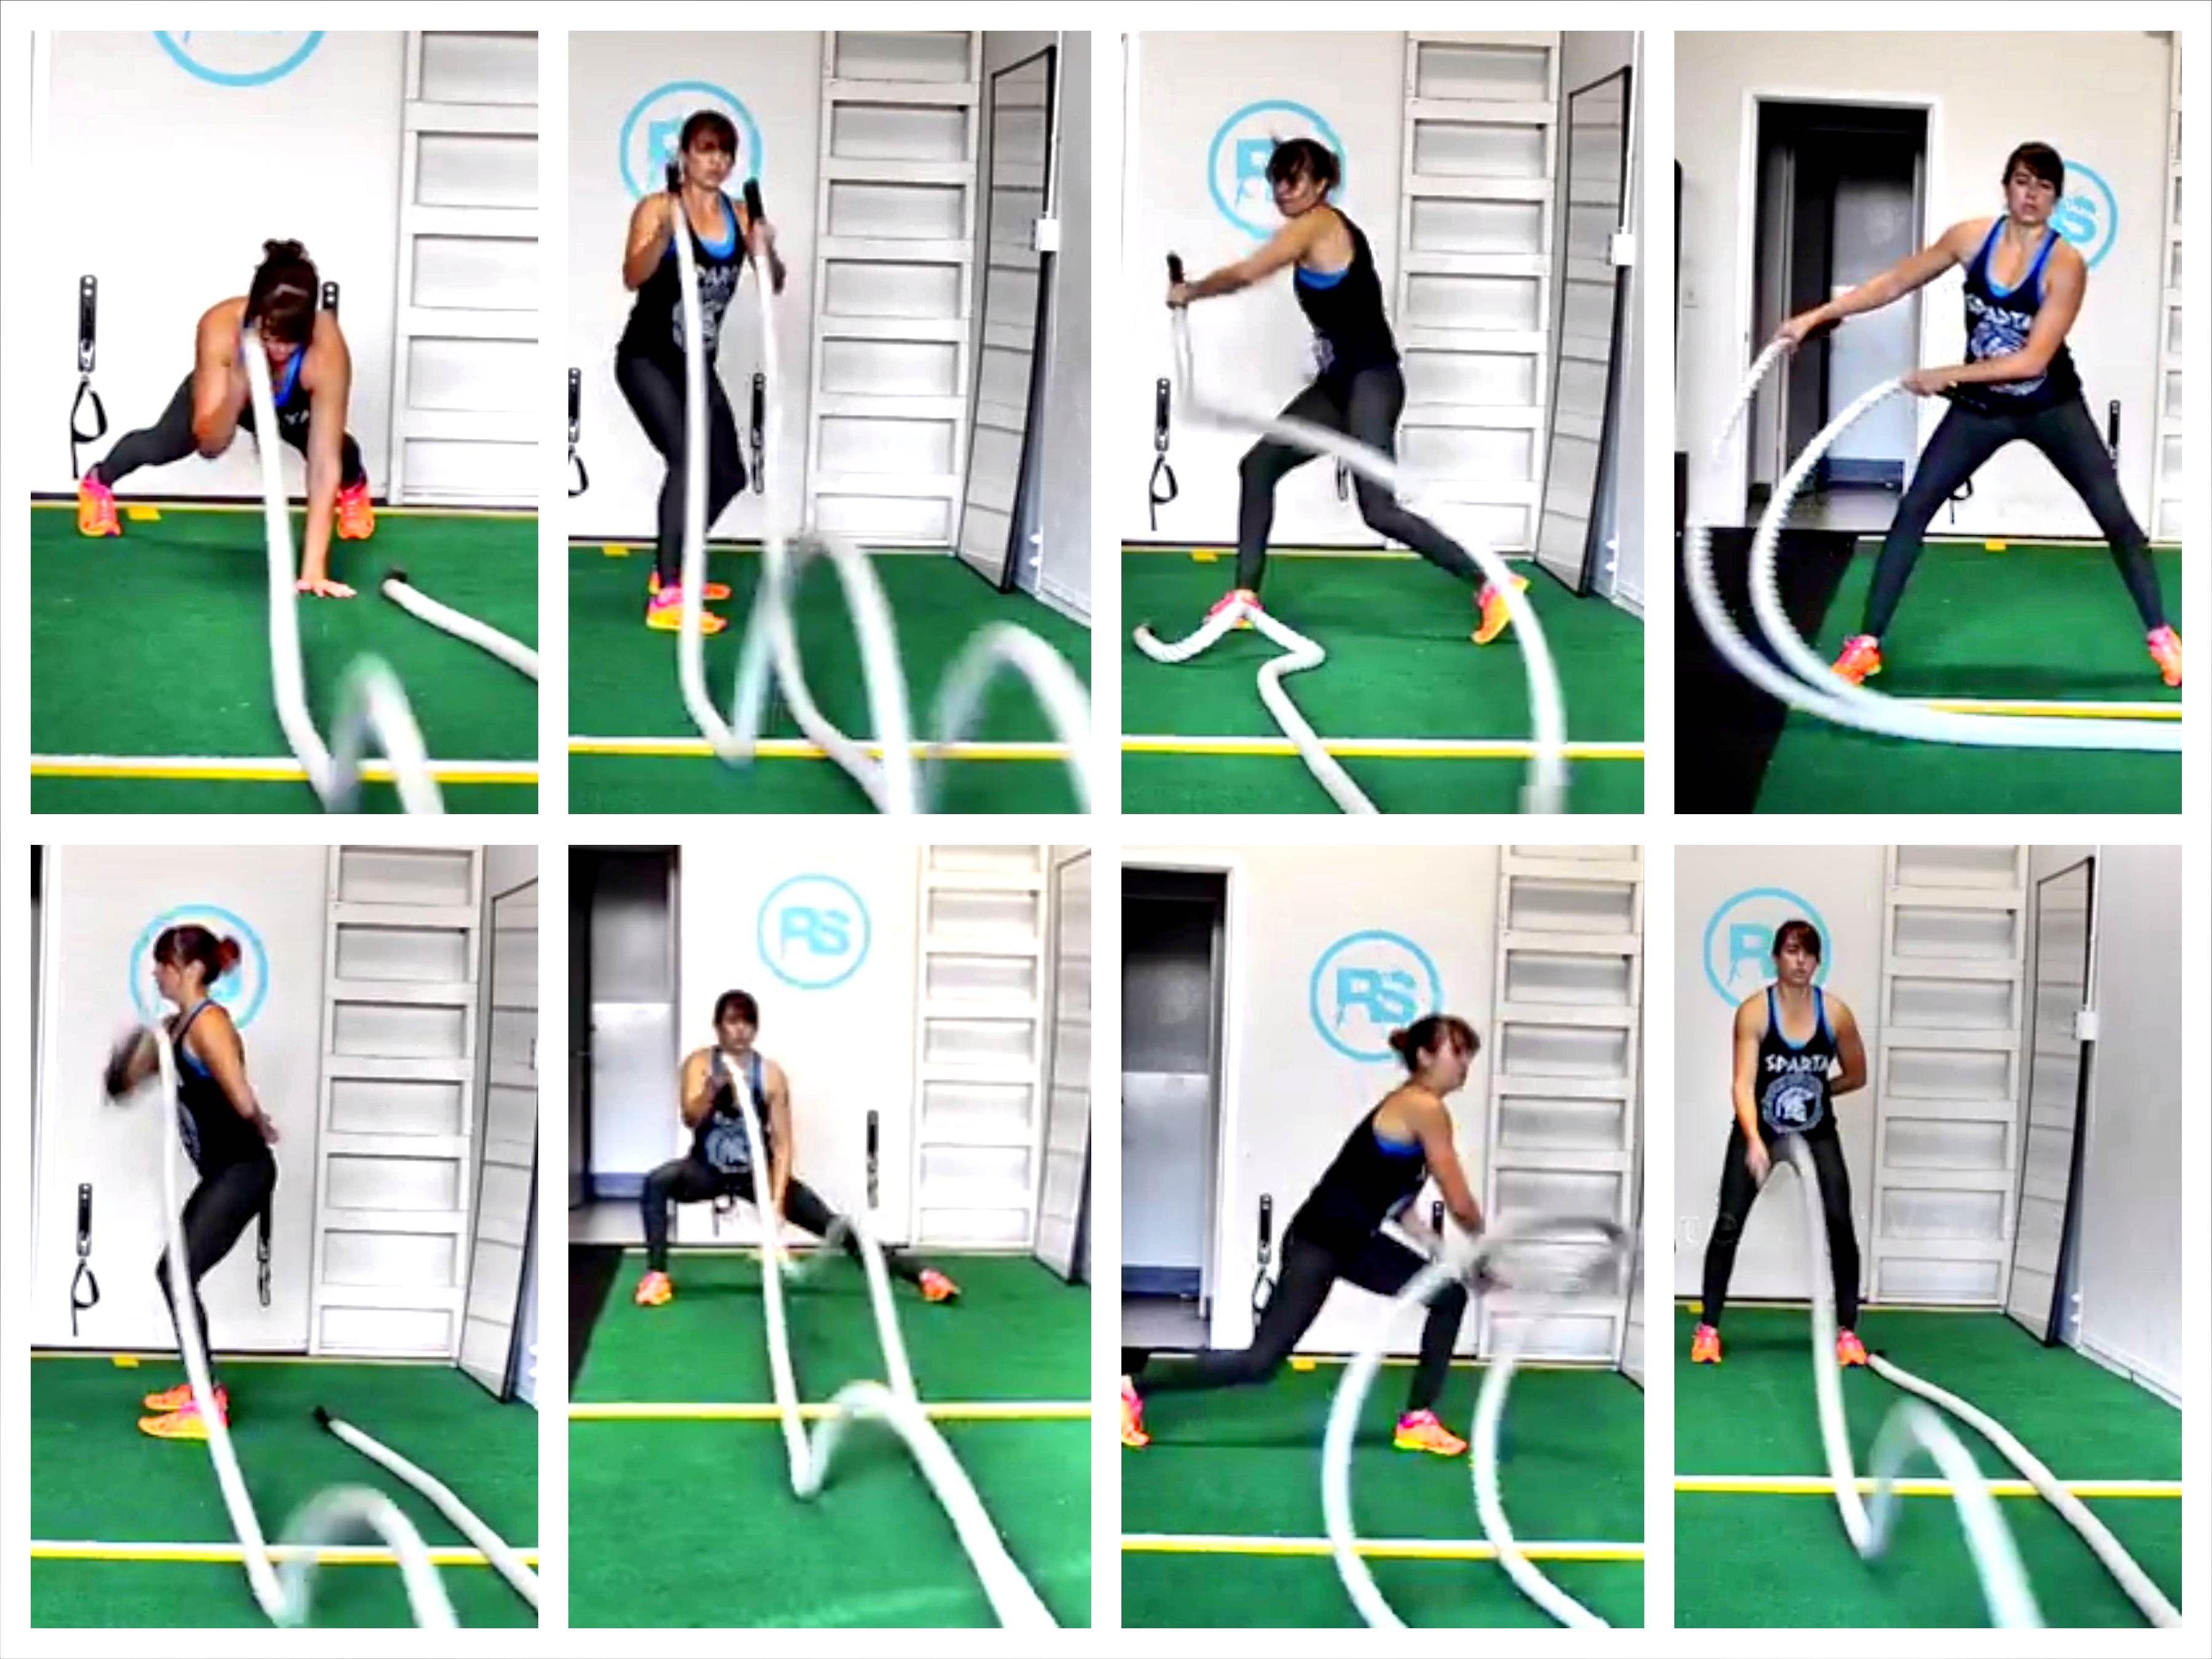 Battling Ropes Exercises Redefining Strength Battle Rope Workout Rope Exercises Battle Ropes